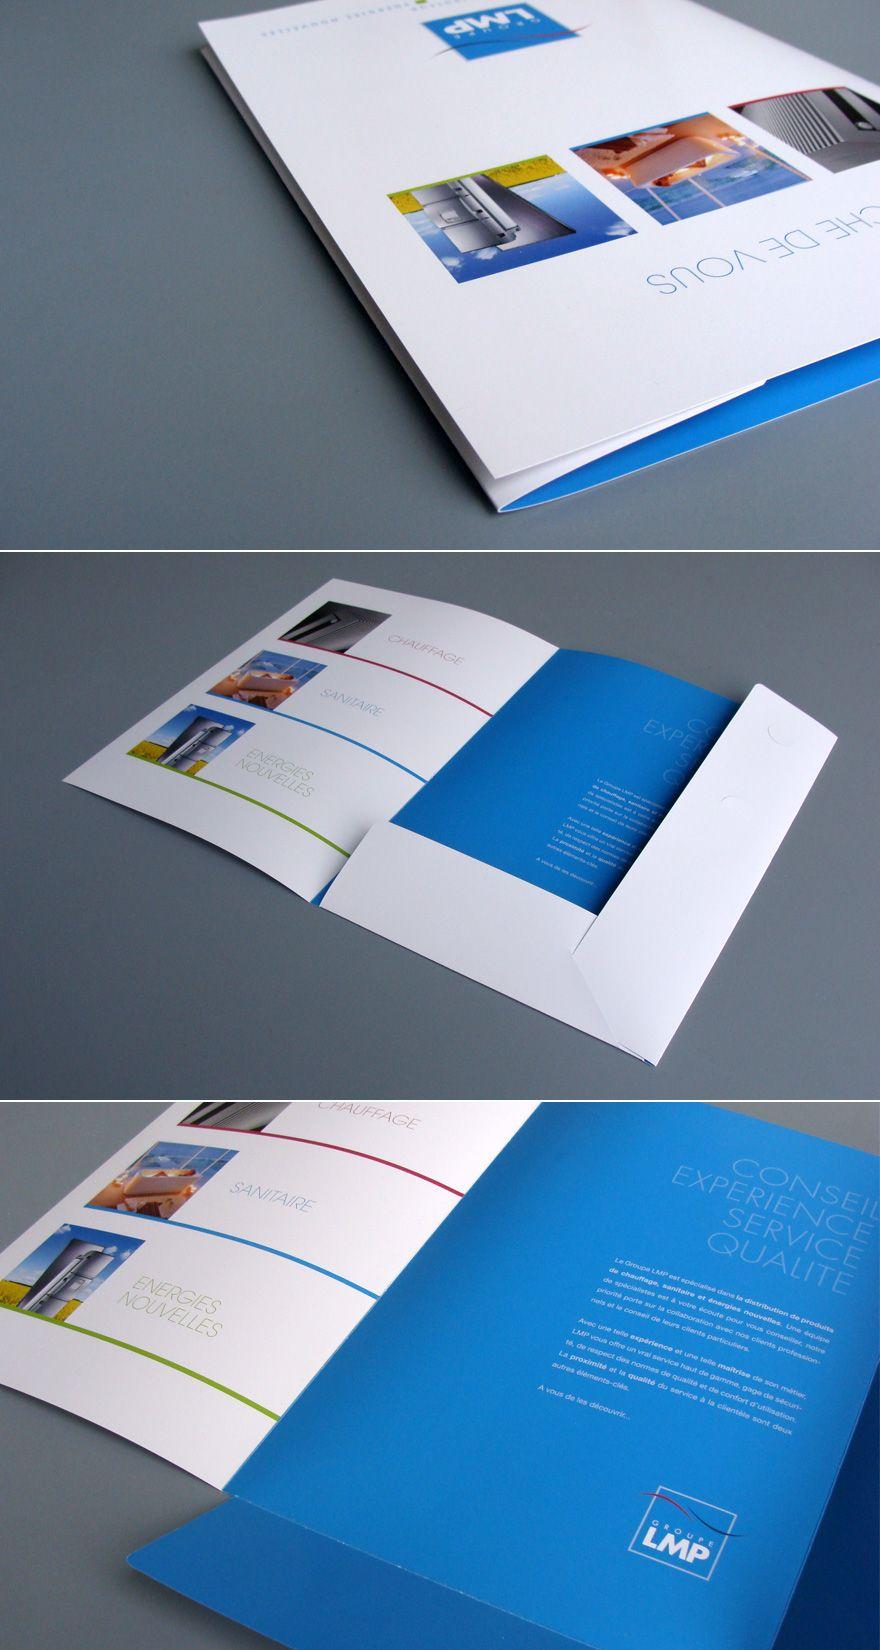 Creattica Folder Graphic Design Pocket Folder Design Presentation Folder Design